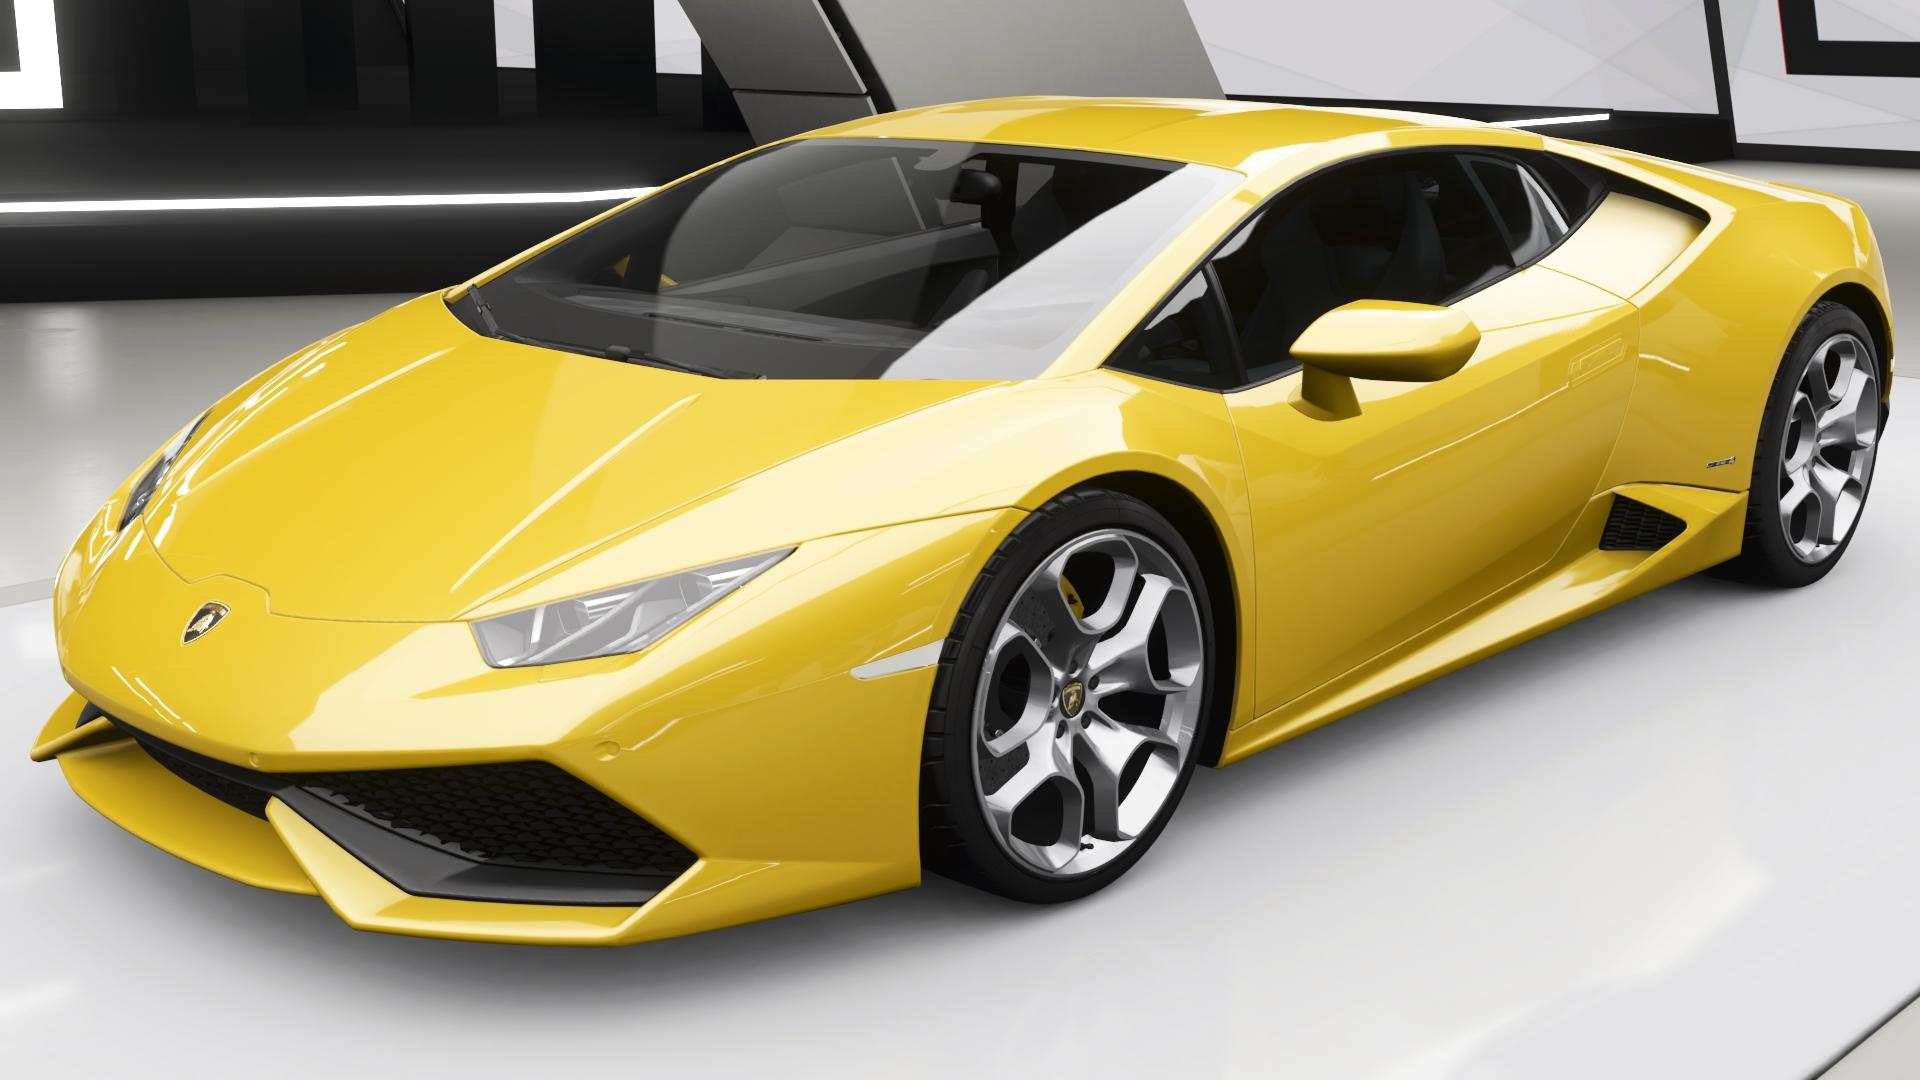 Lamborghini Huracan Lp 610 4 Forza Motorsport Wiki Fandom